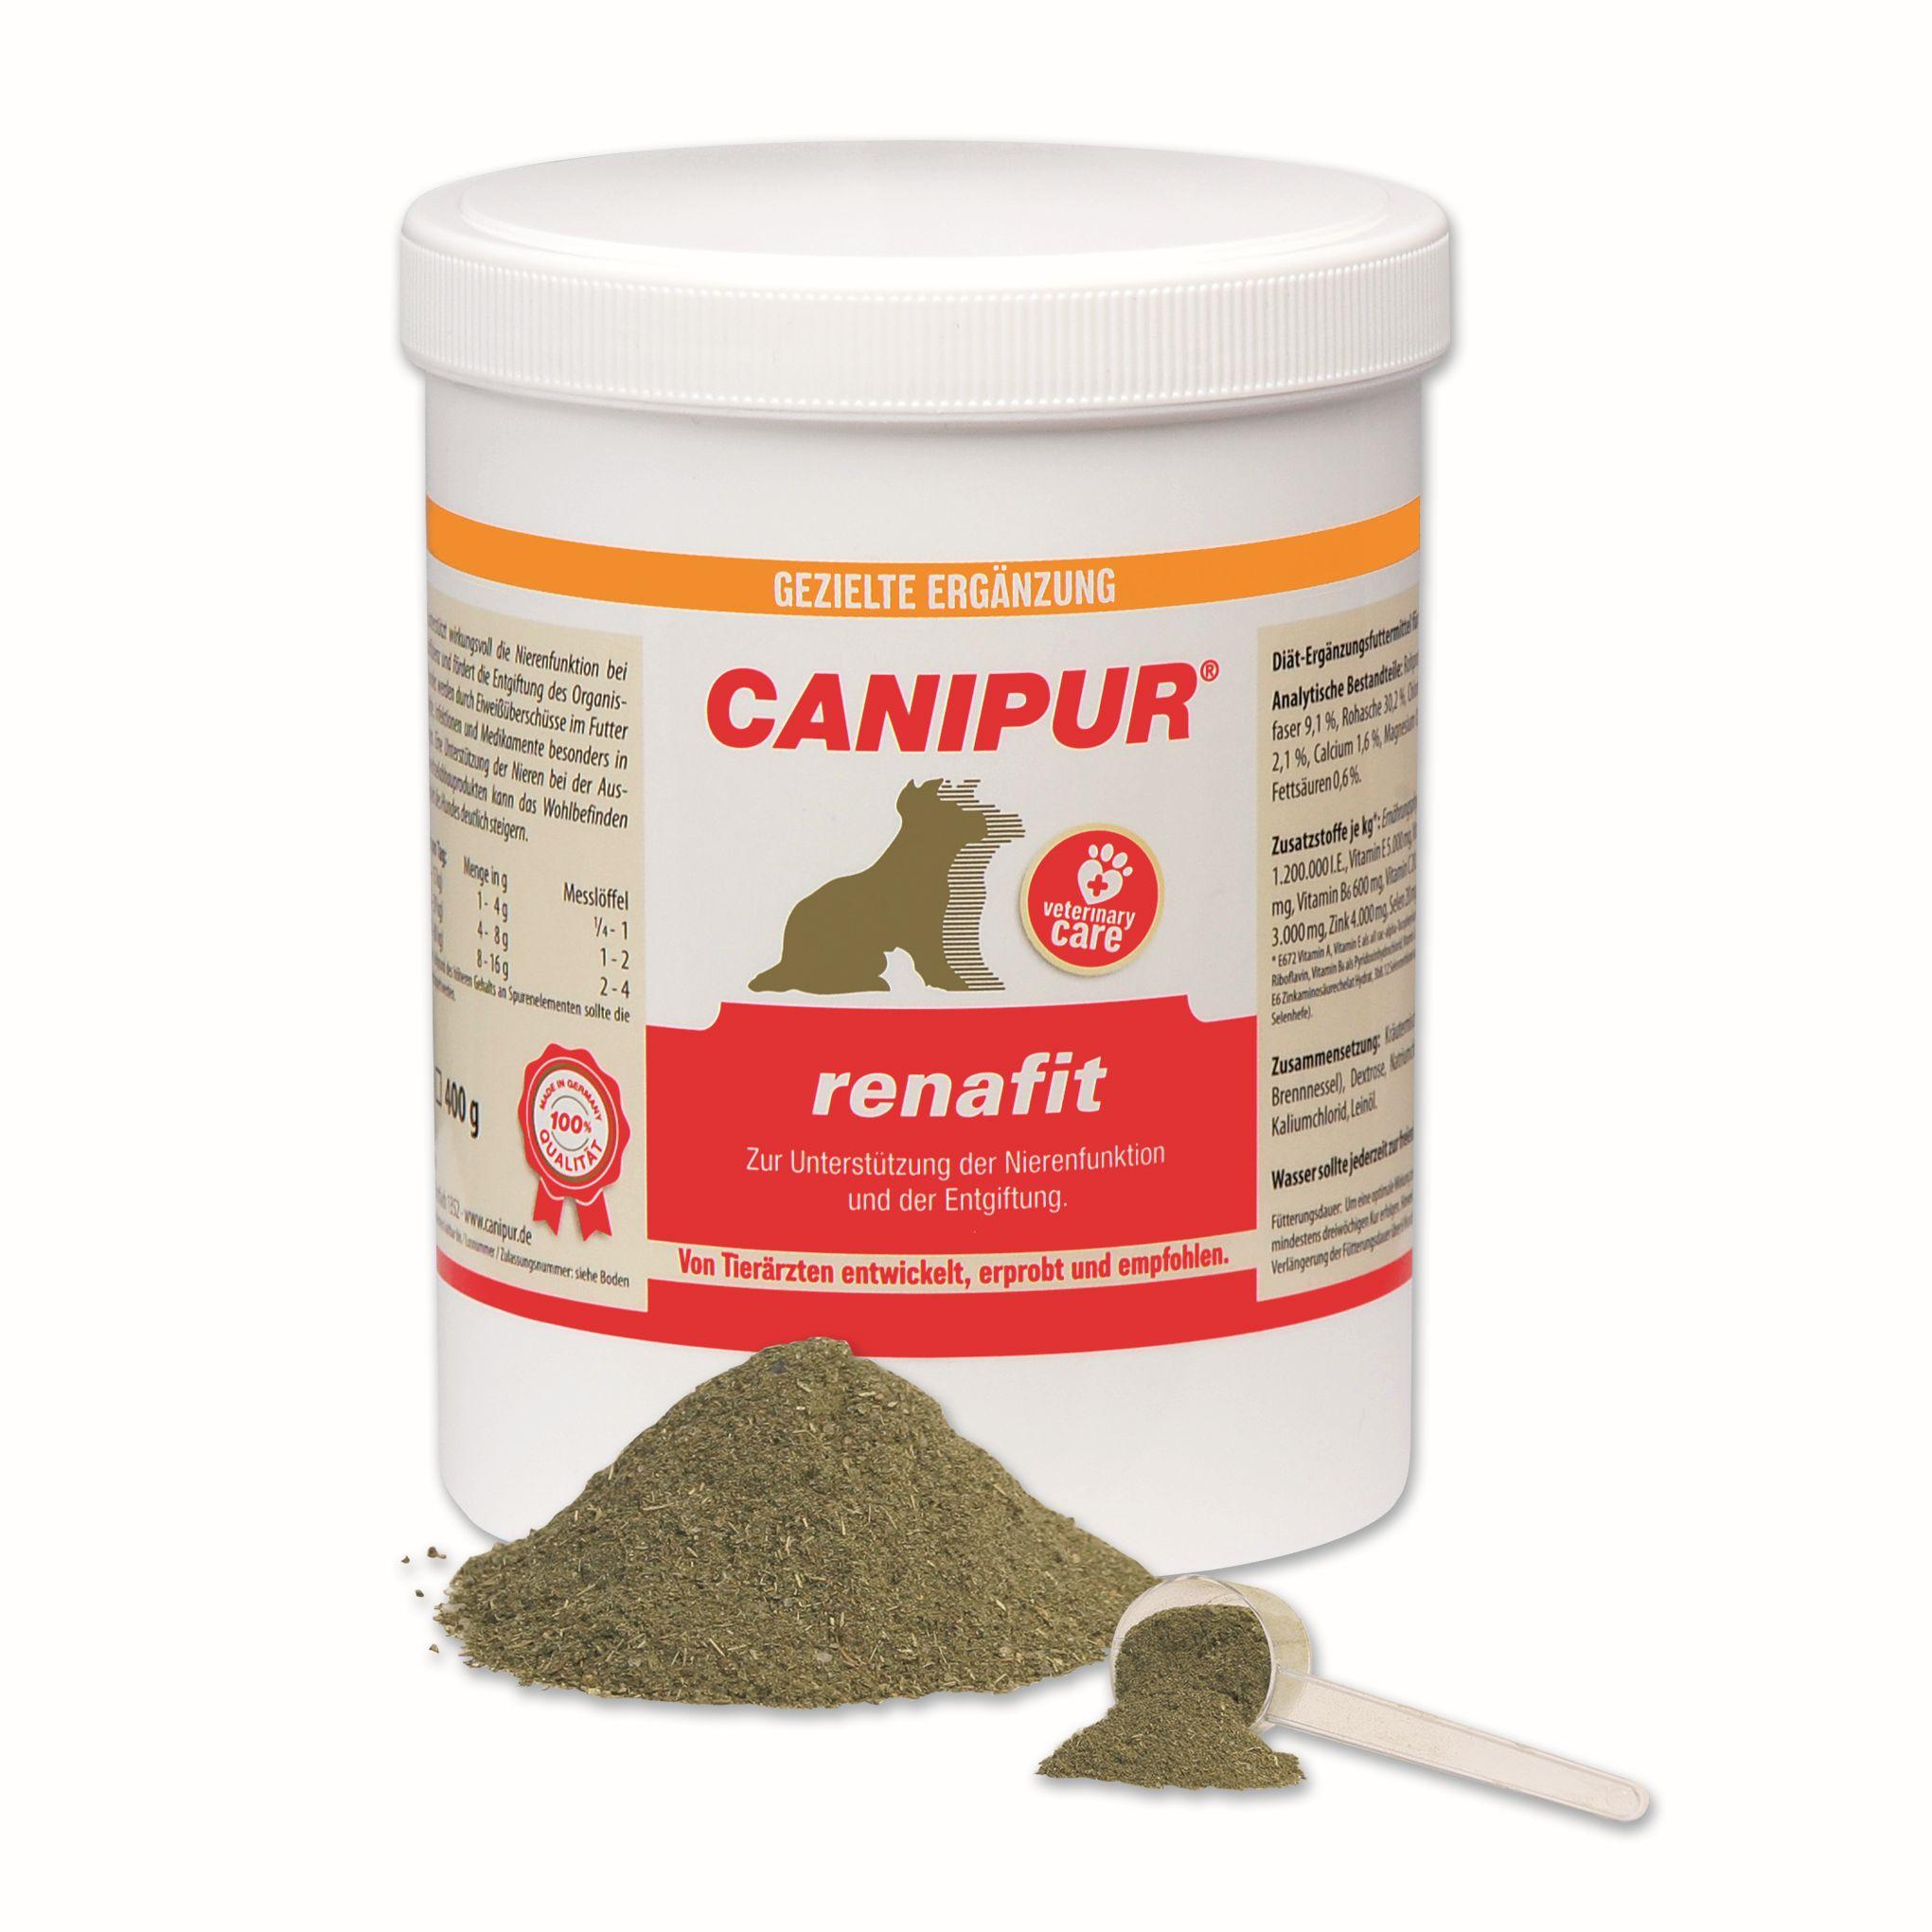 Vetripharm Canipur renafit